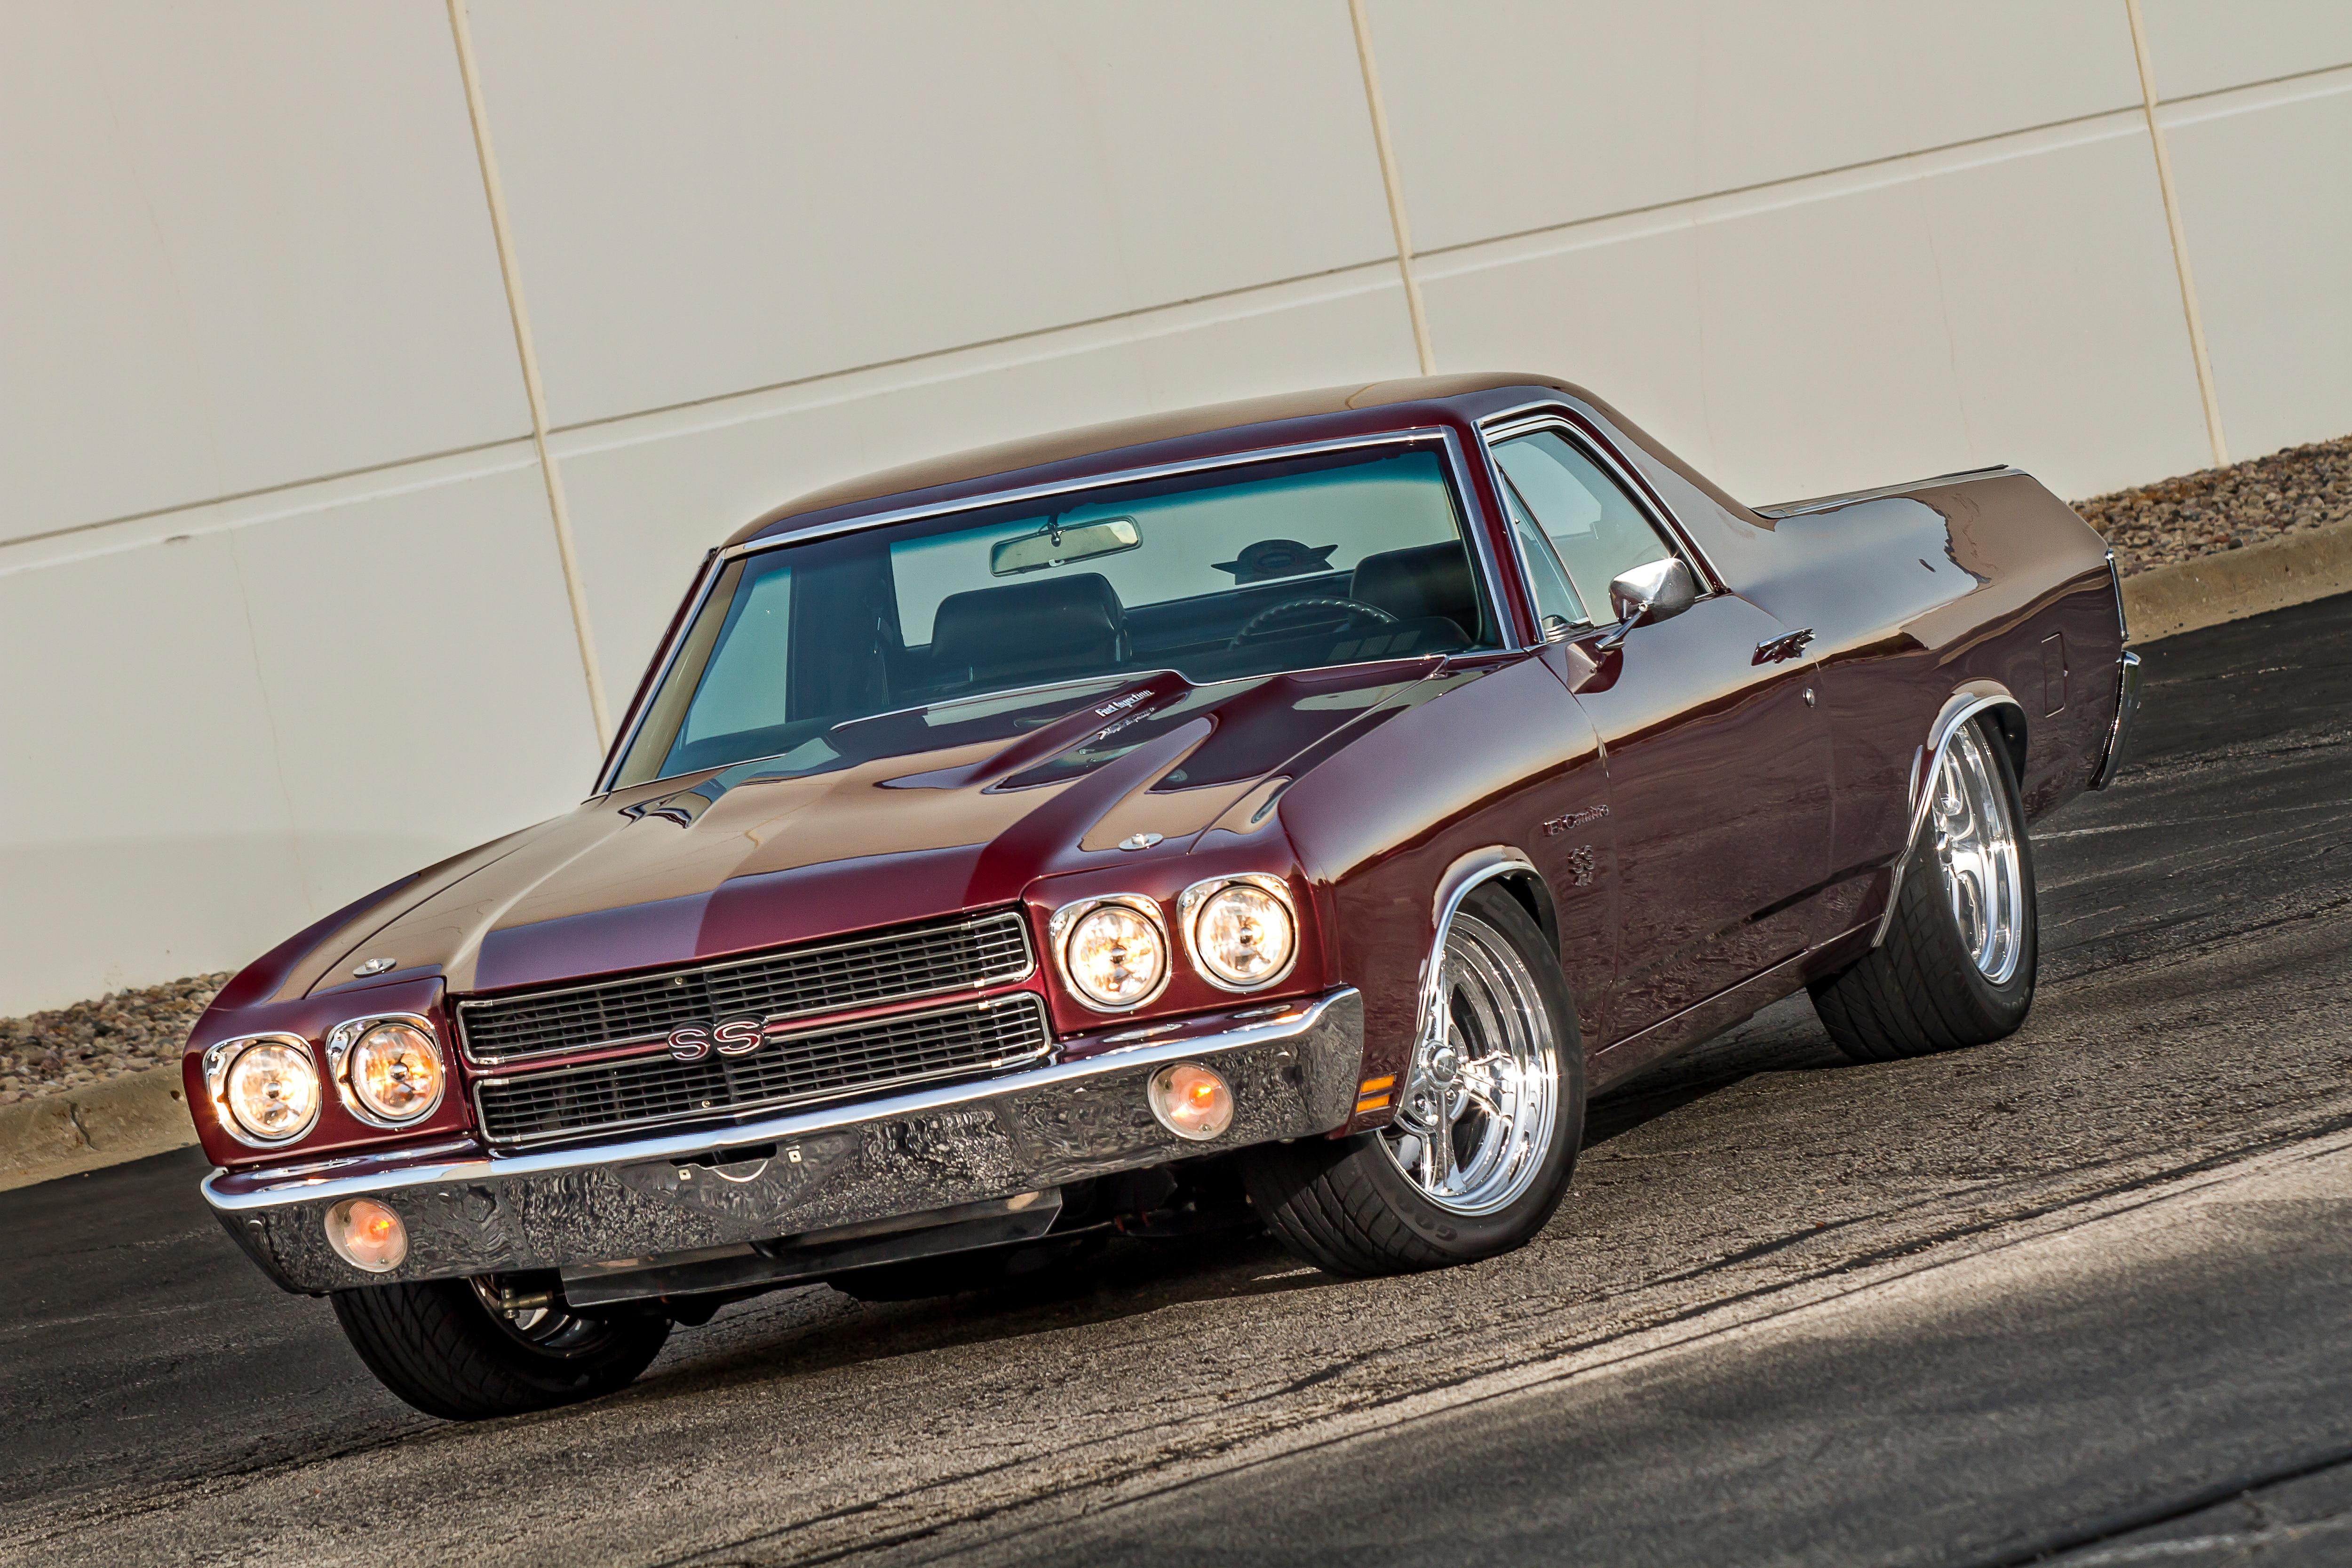 How One Enthusiast Built a 500-HP 1970 Chevrolet El Camino SS